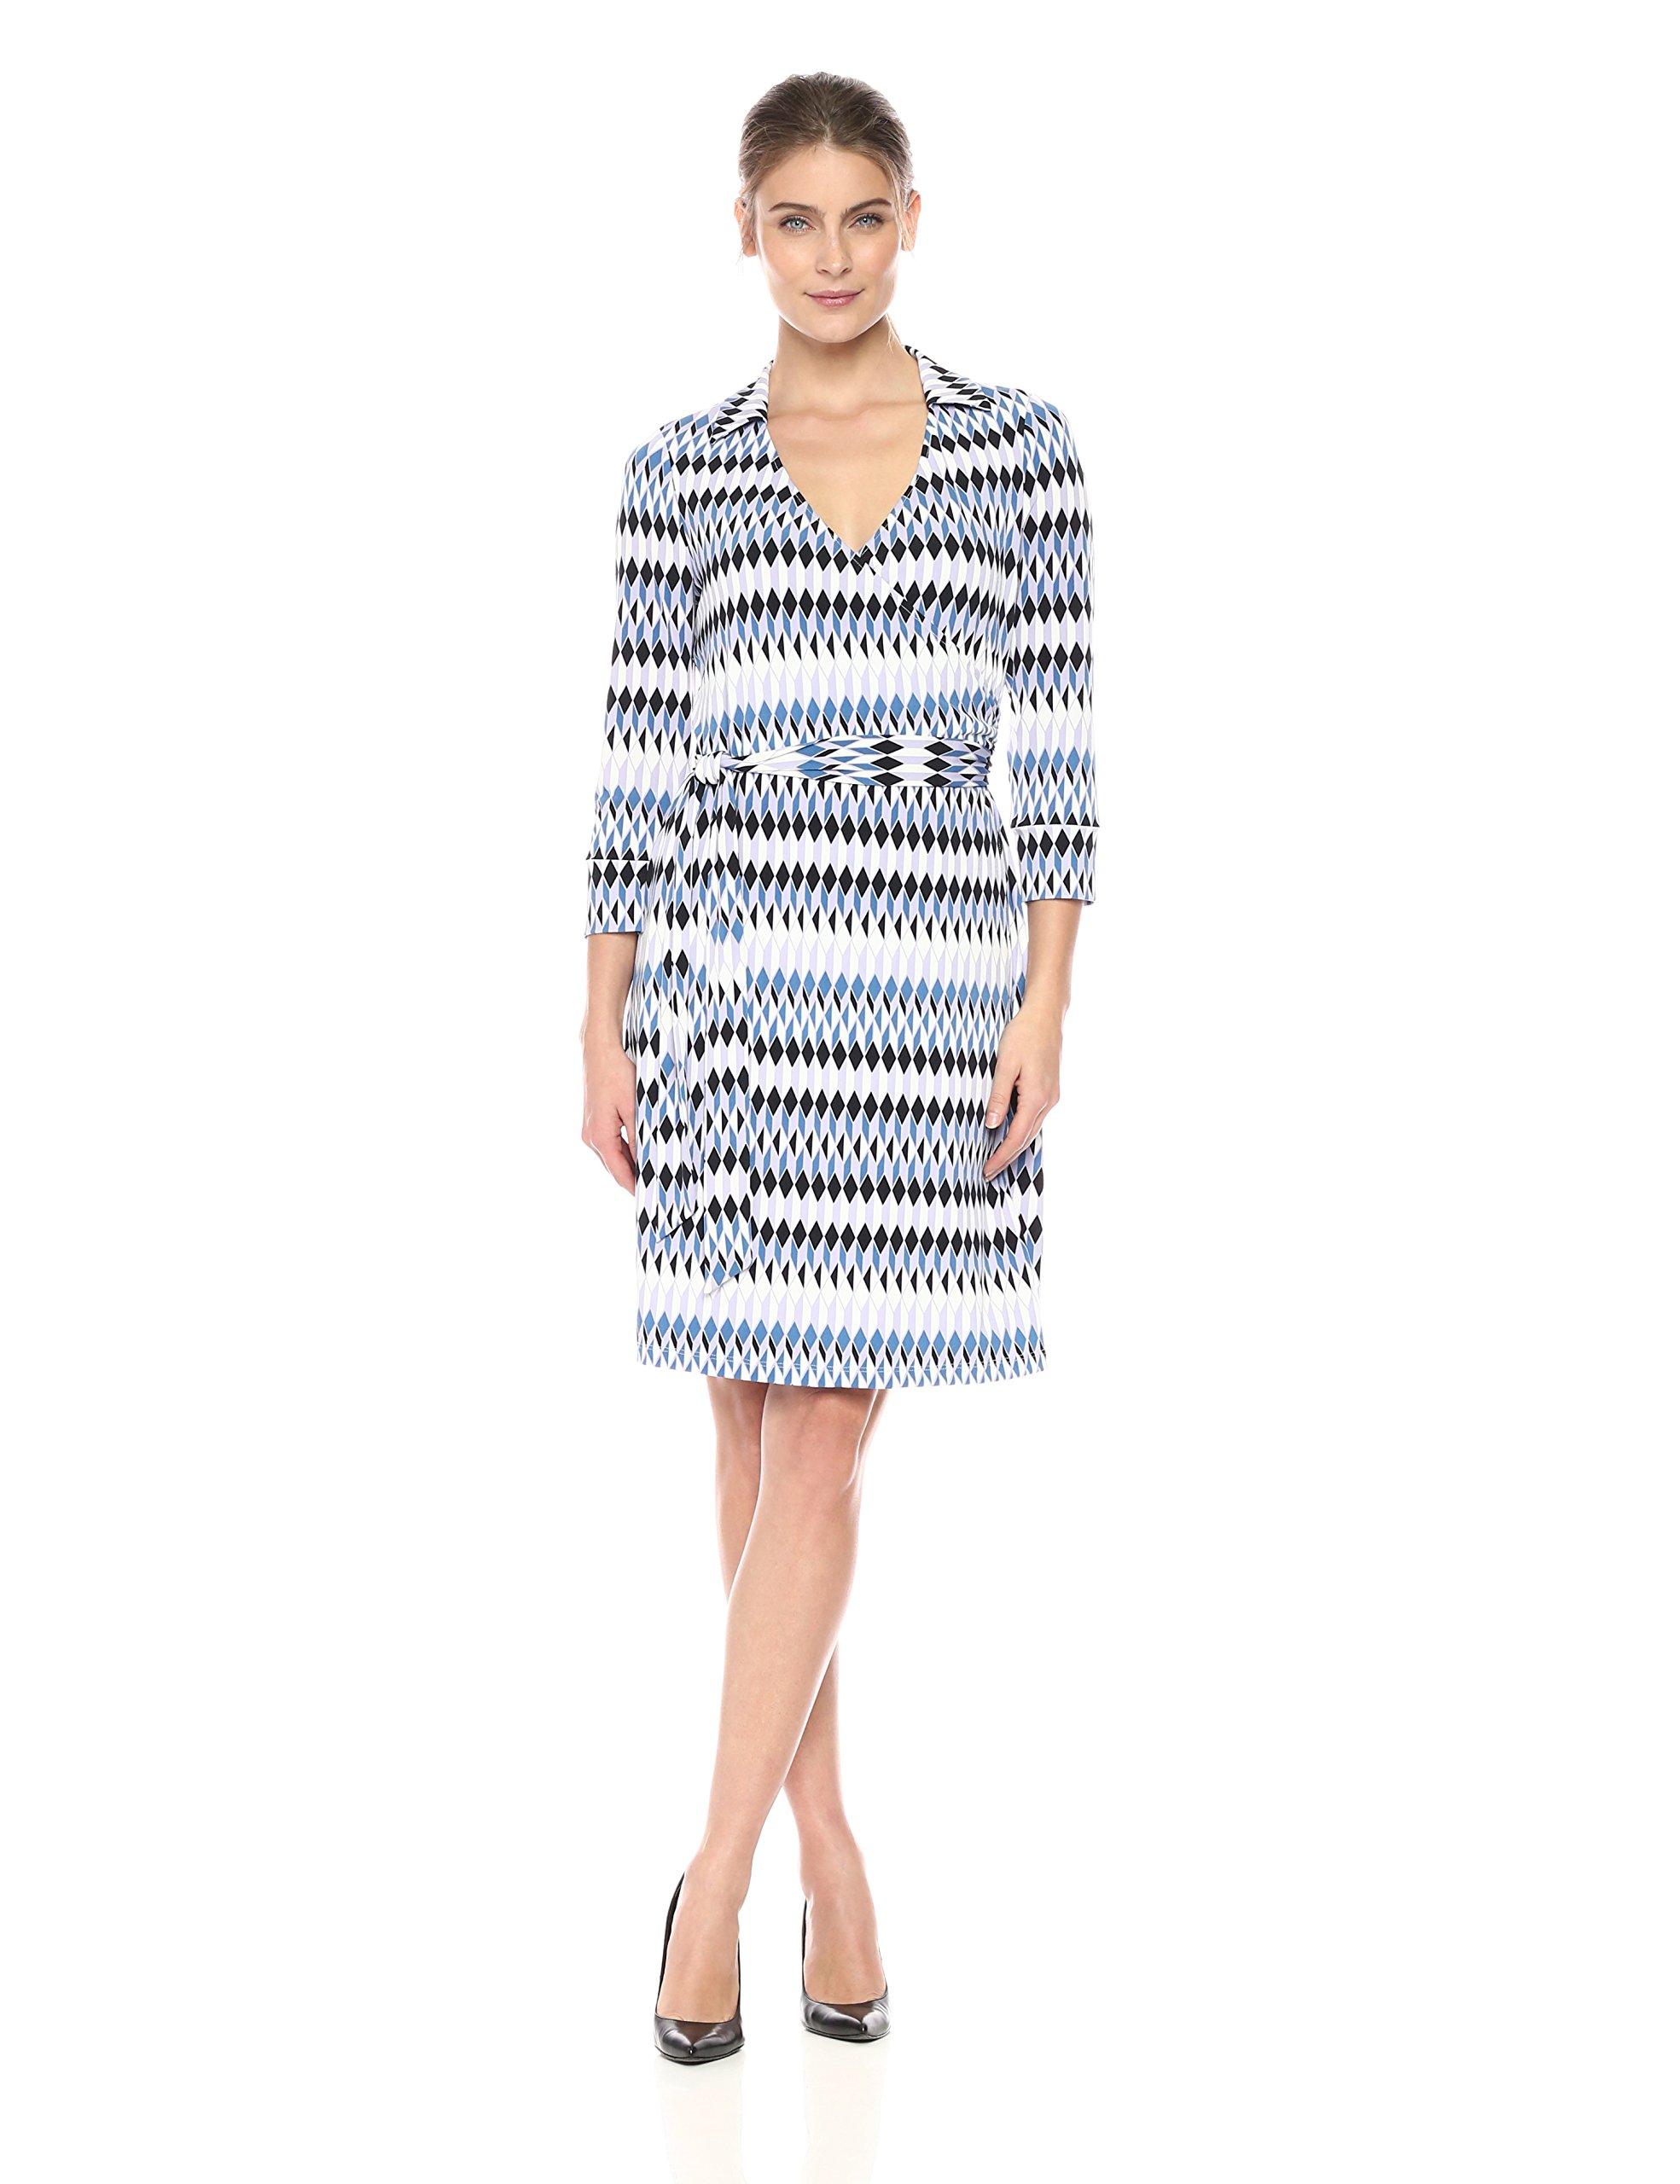 Lark & Ro Women's Three Quarter Sleeve Patterned Wrap Dress, Geo, L